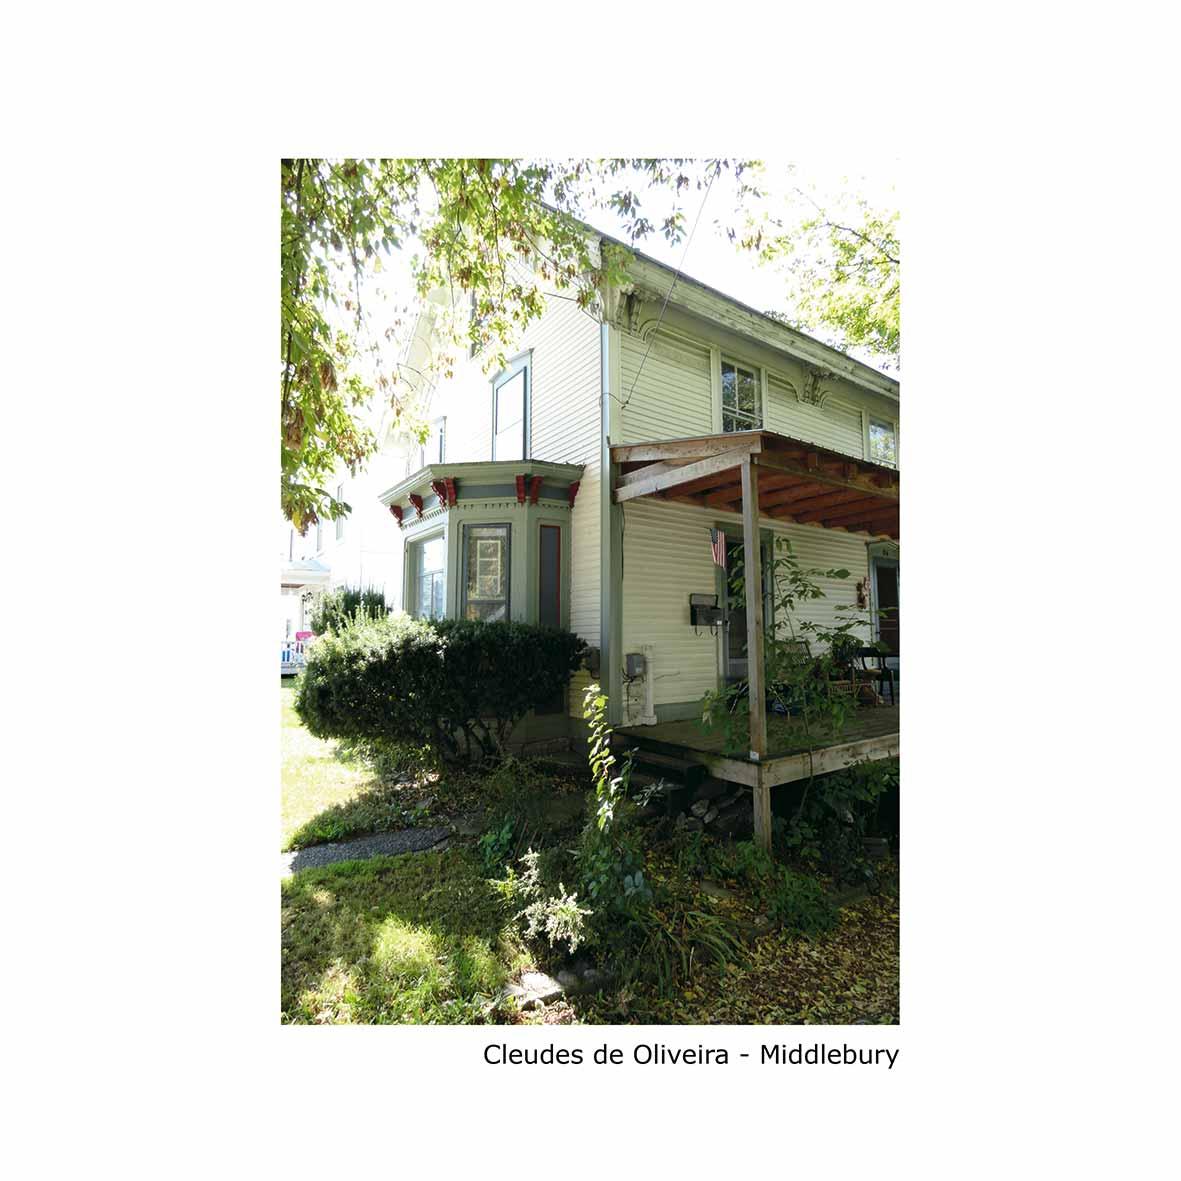 Cleudes-de-Oliveira---Middlebury